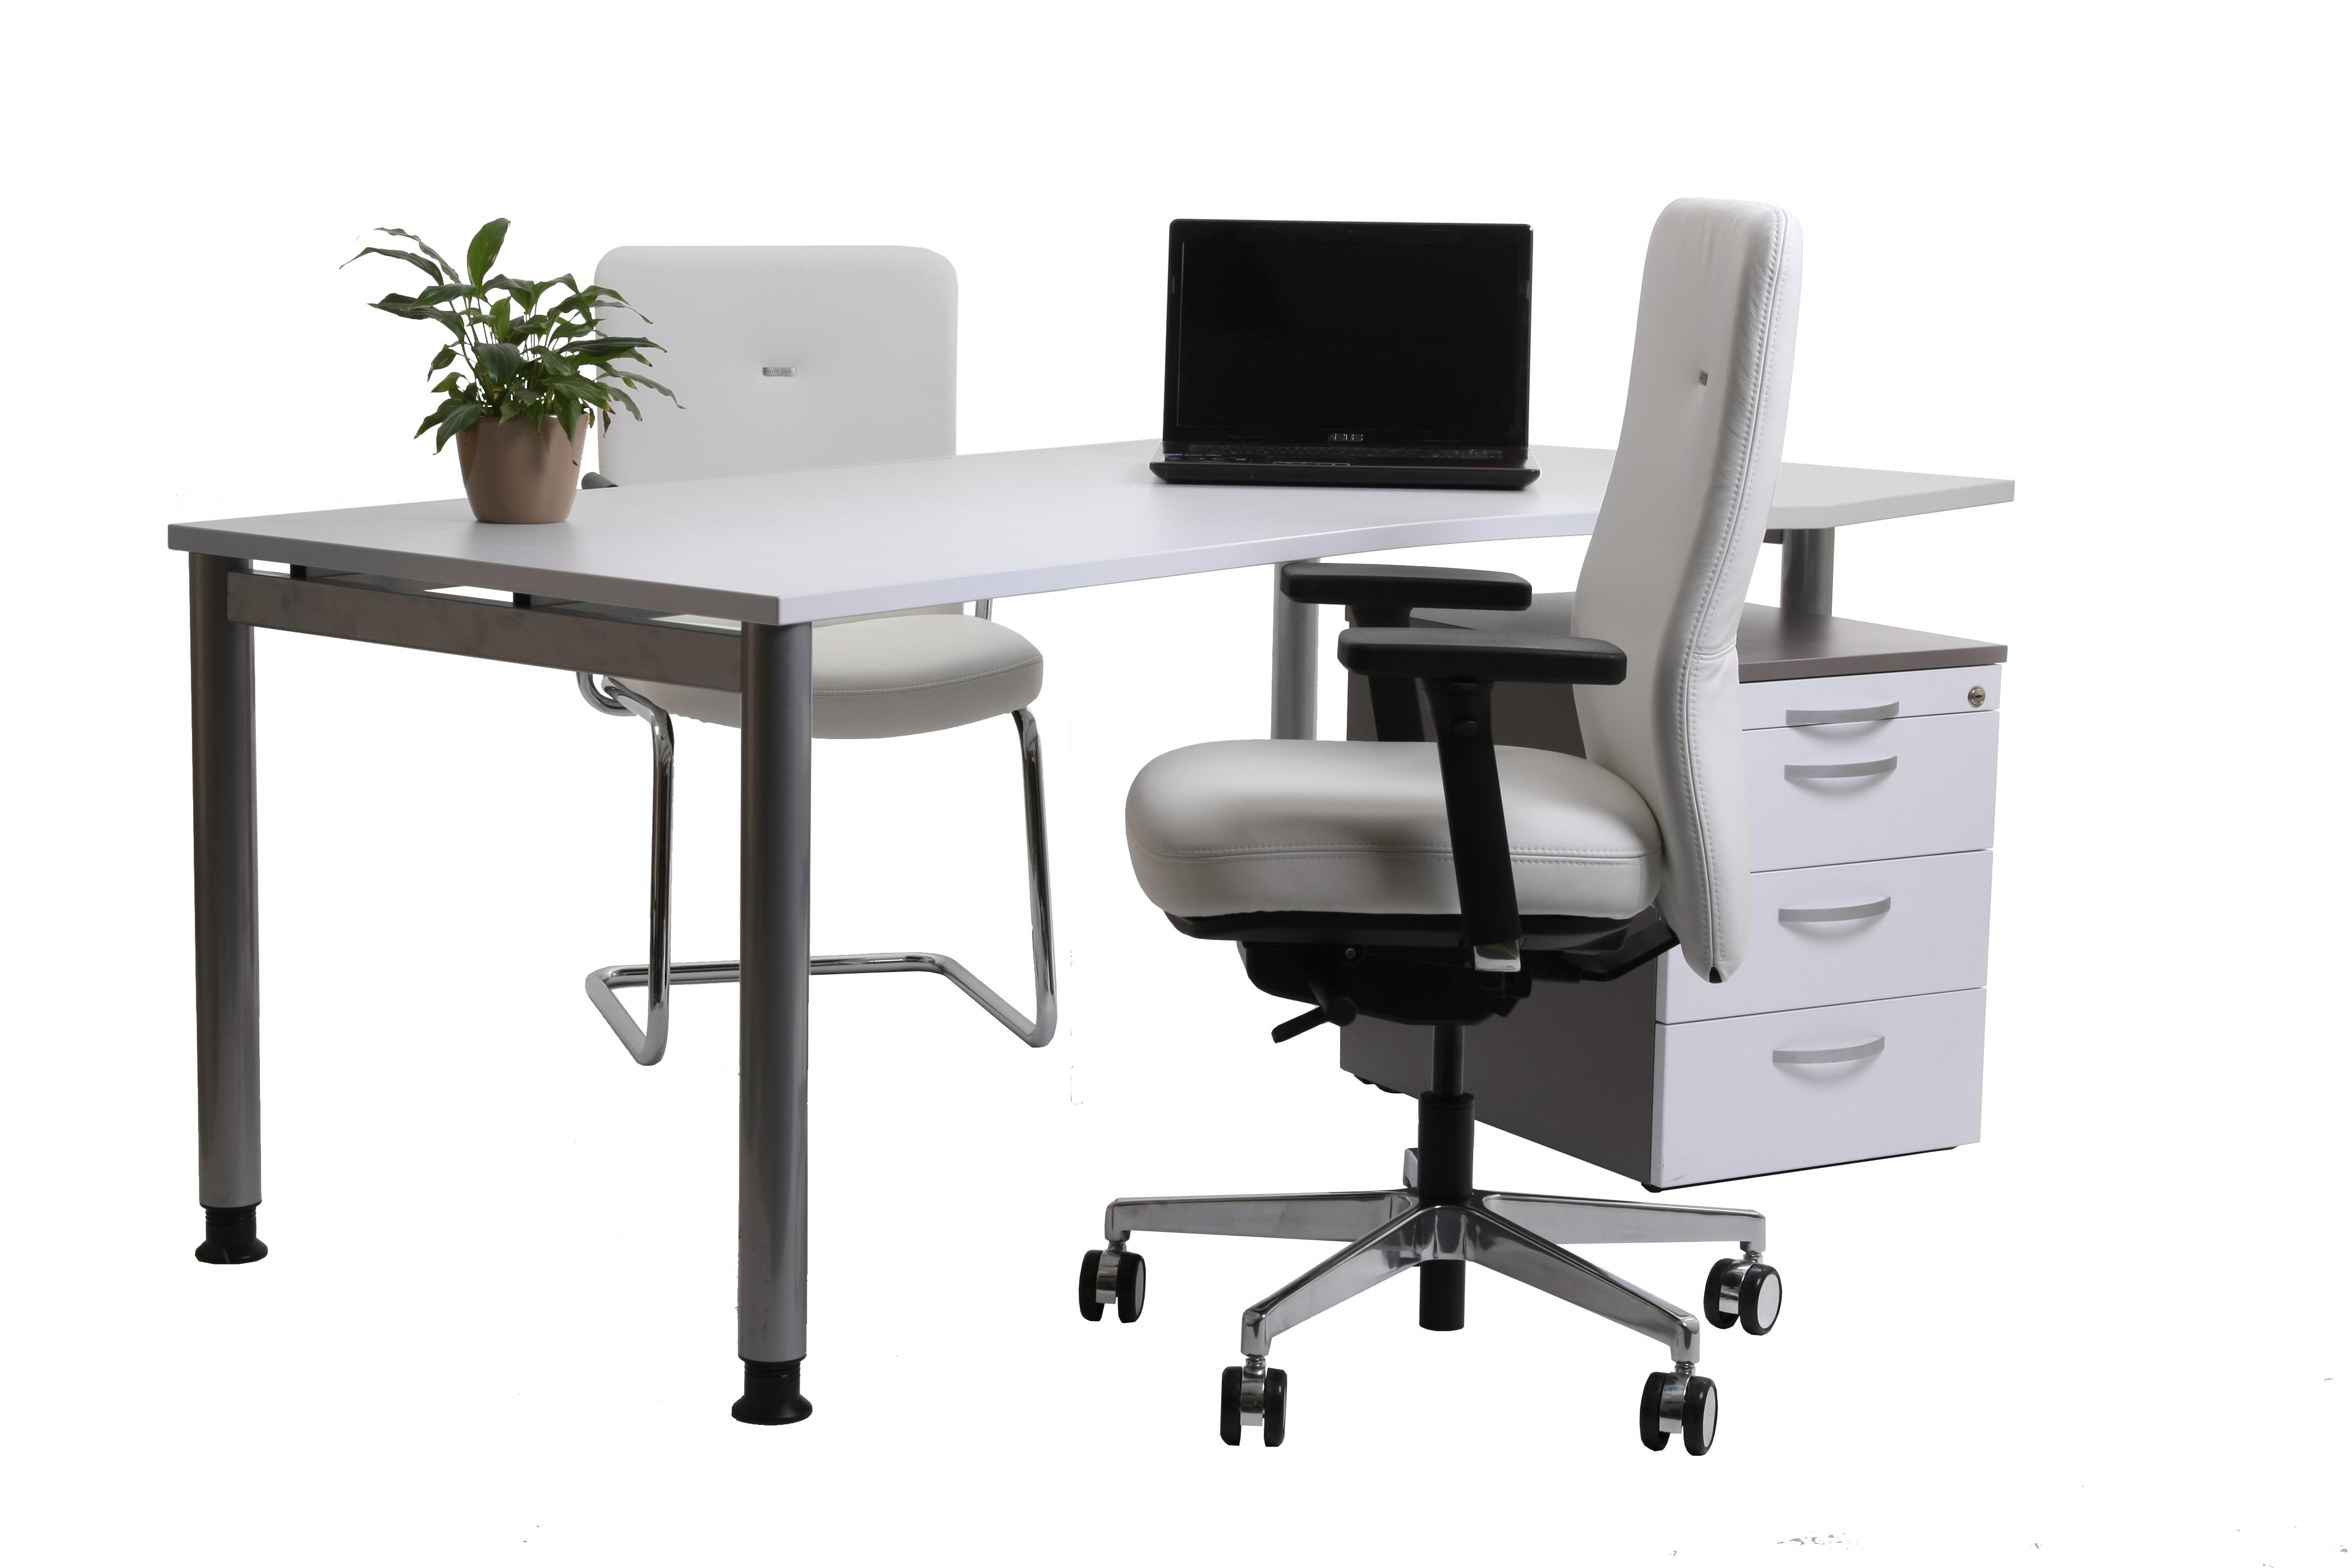 Ergonomischer Bürostuhl agilis - Arbeitsplatz